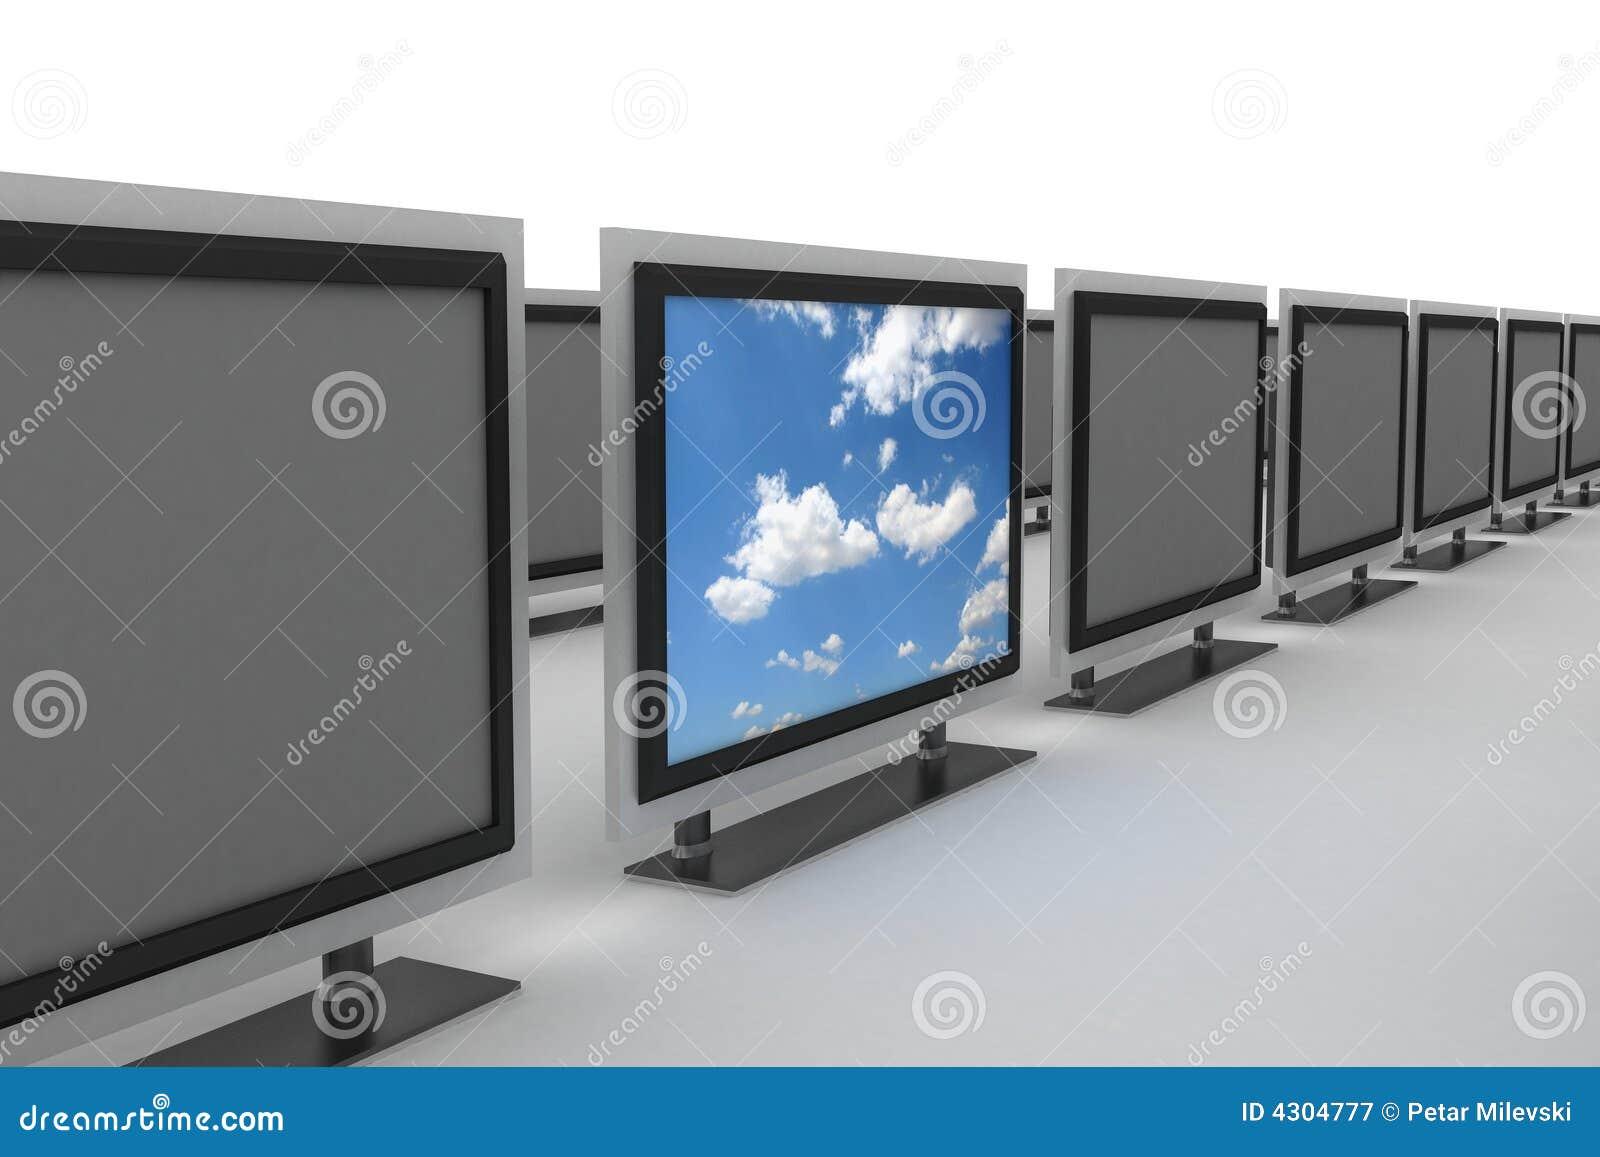 Plasma tv standing out 2 stock illustration  Illustration of